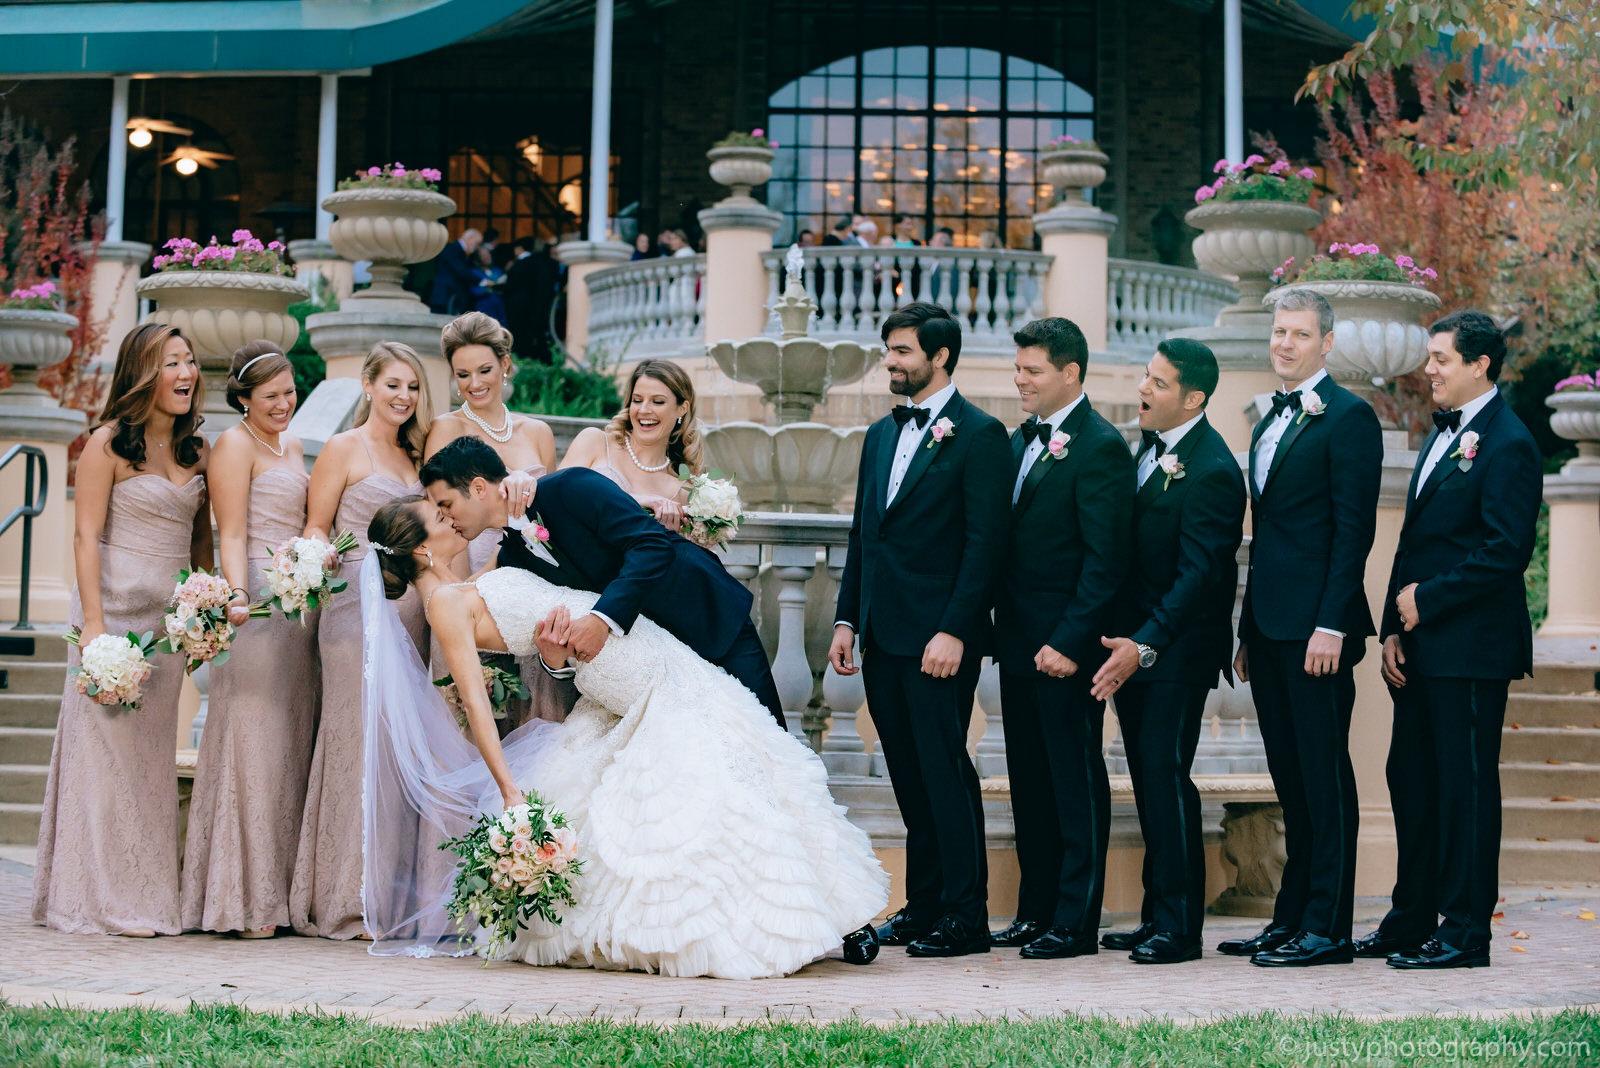 Omni Shoreham wedding photos-washington-dc-wedding-venues (136 of 171).jpg